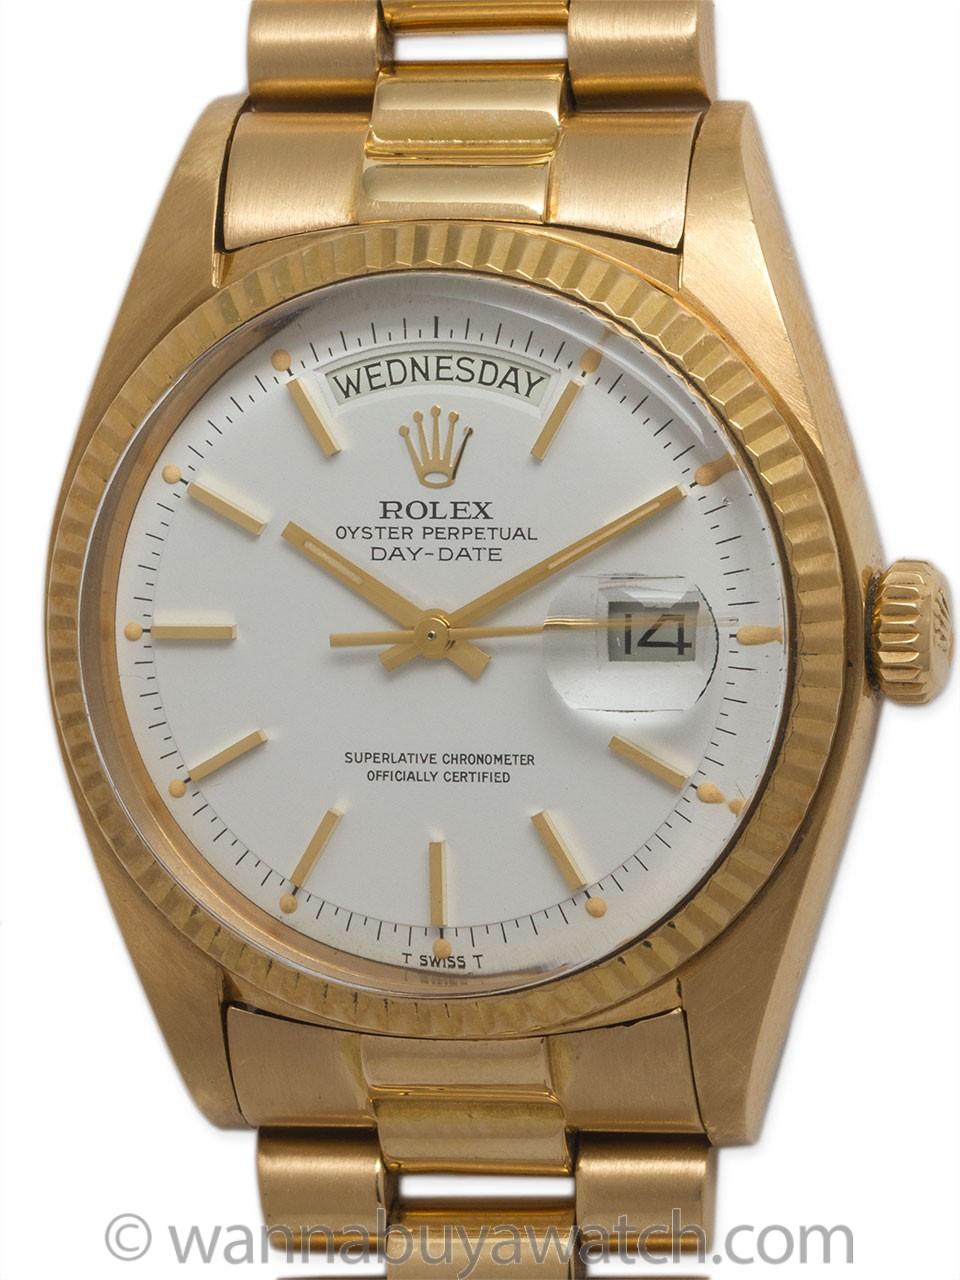 Rolex 18K YG Day Date ref 1803 circa 1973